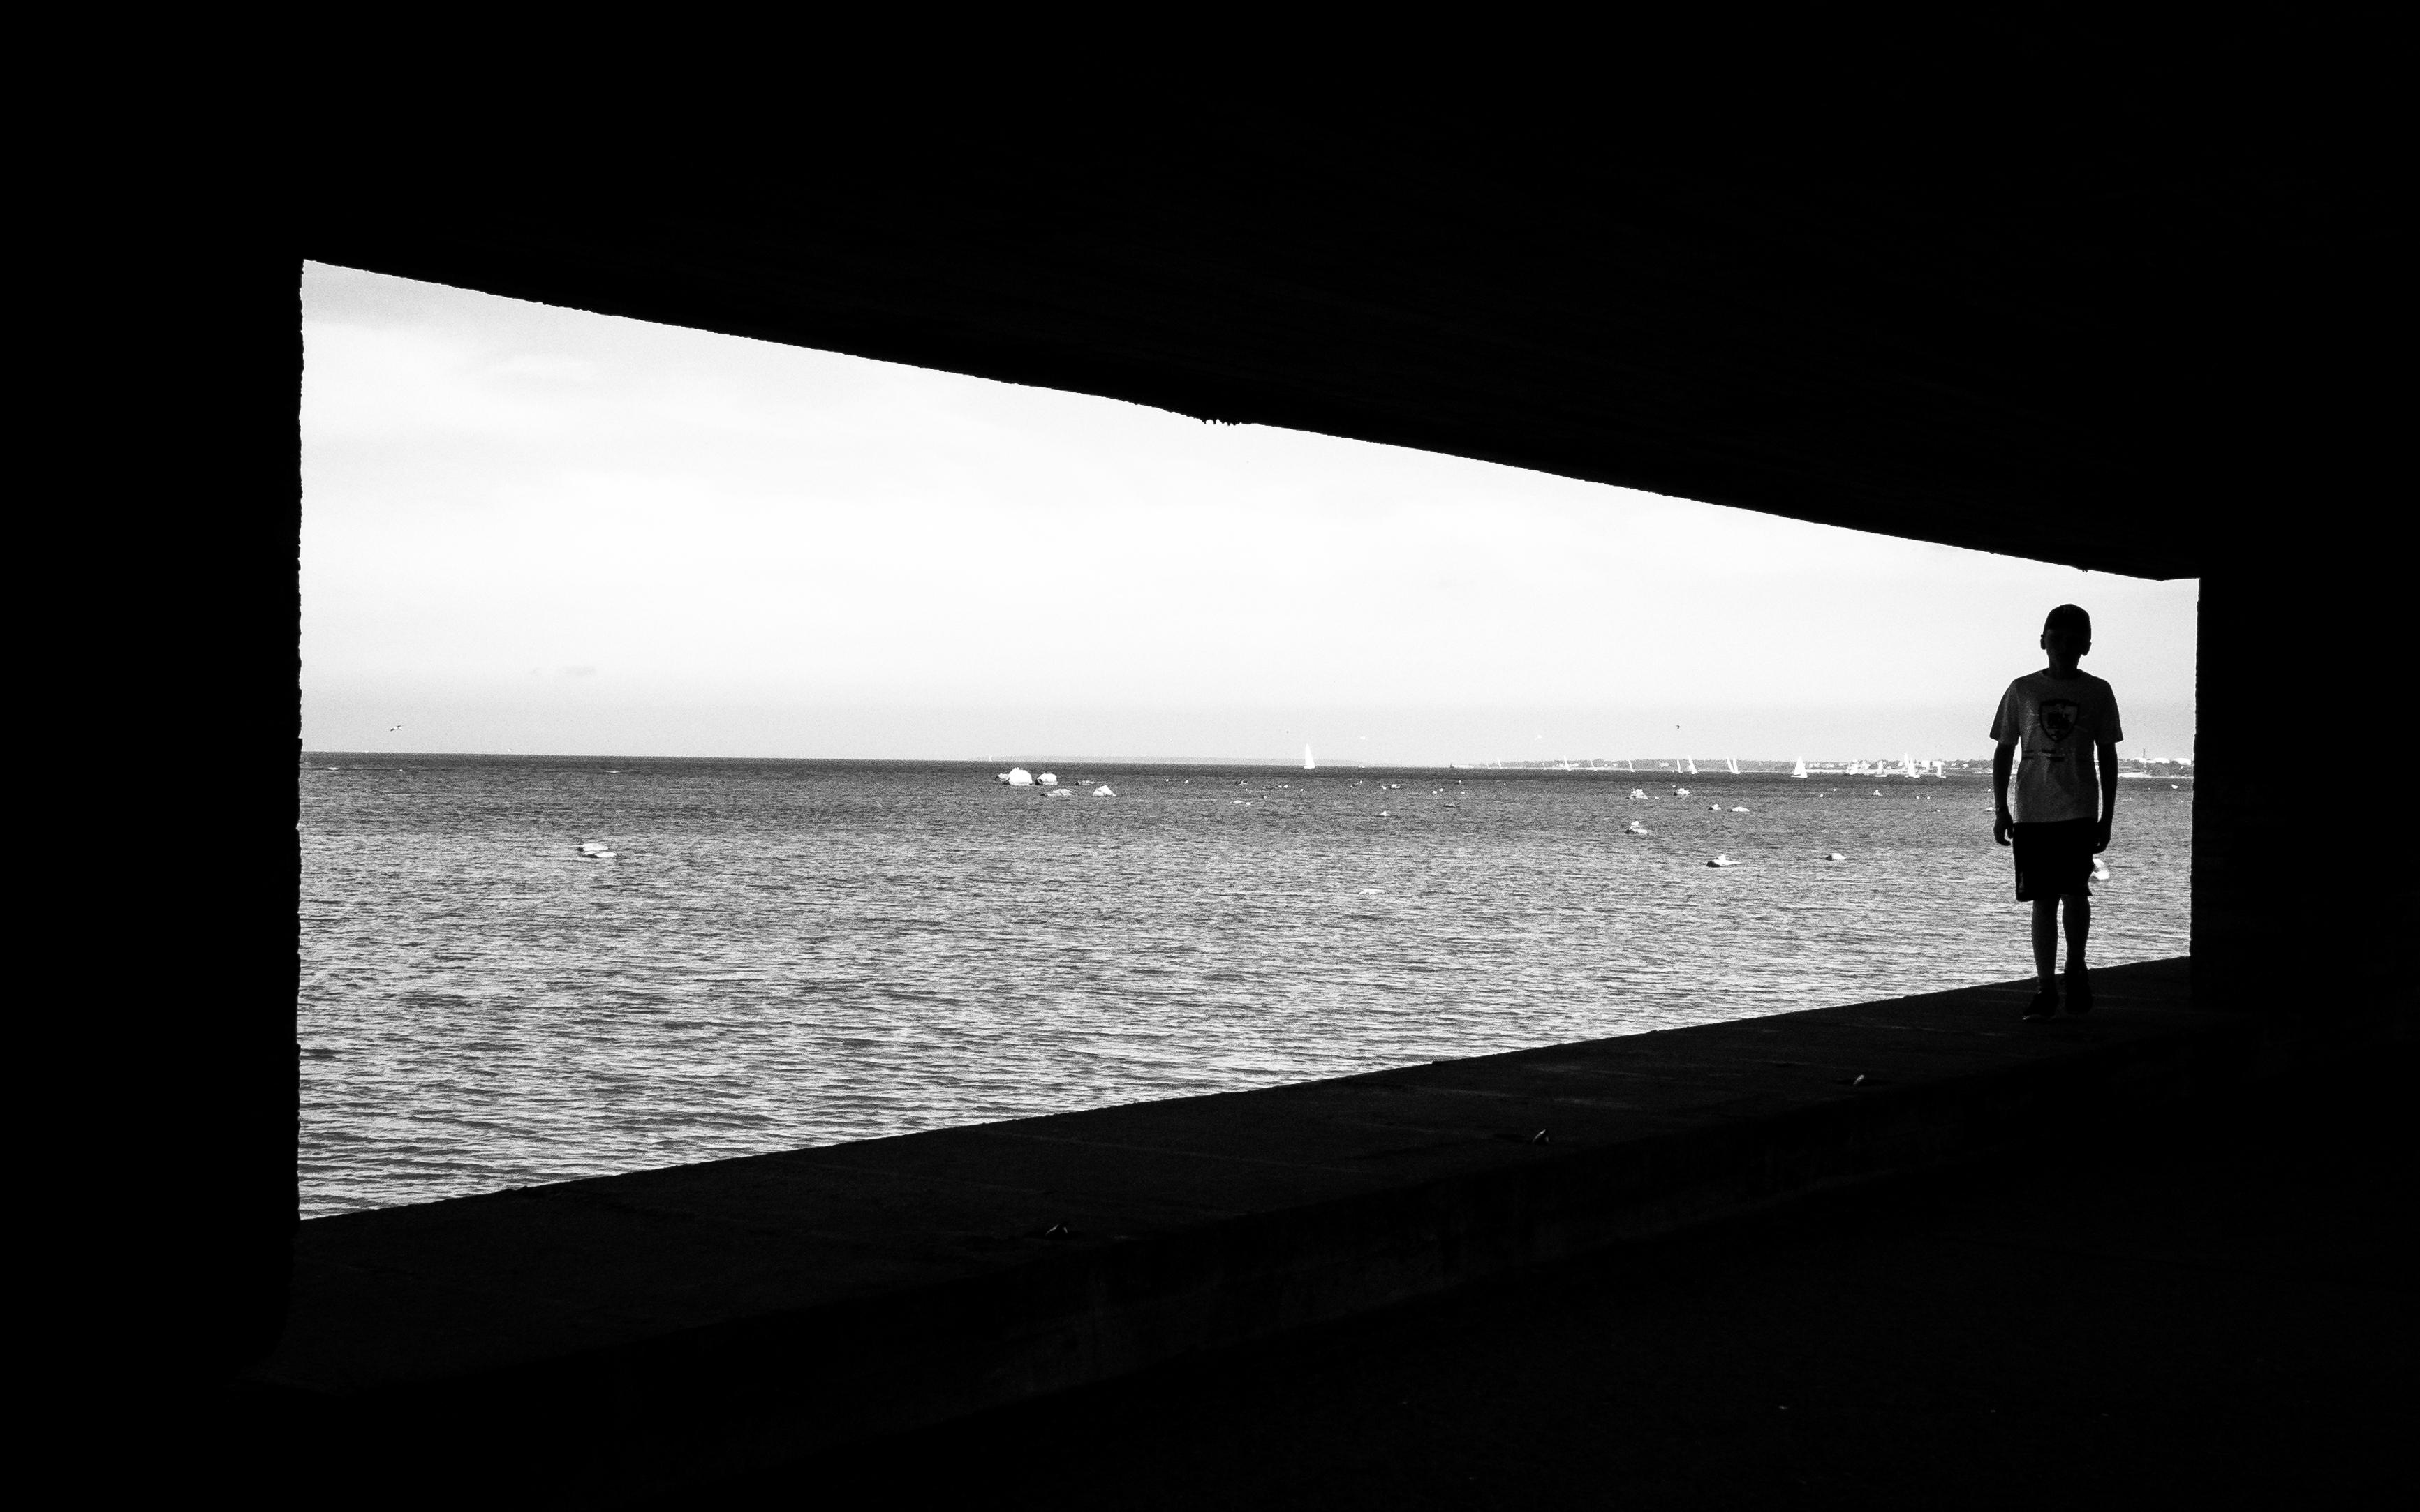 Fotos gratis : mar, costa, Oceano, horizonte, silueta, ligero, en ...